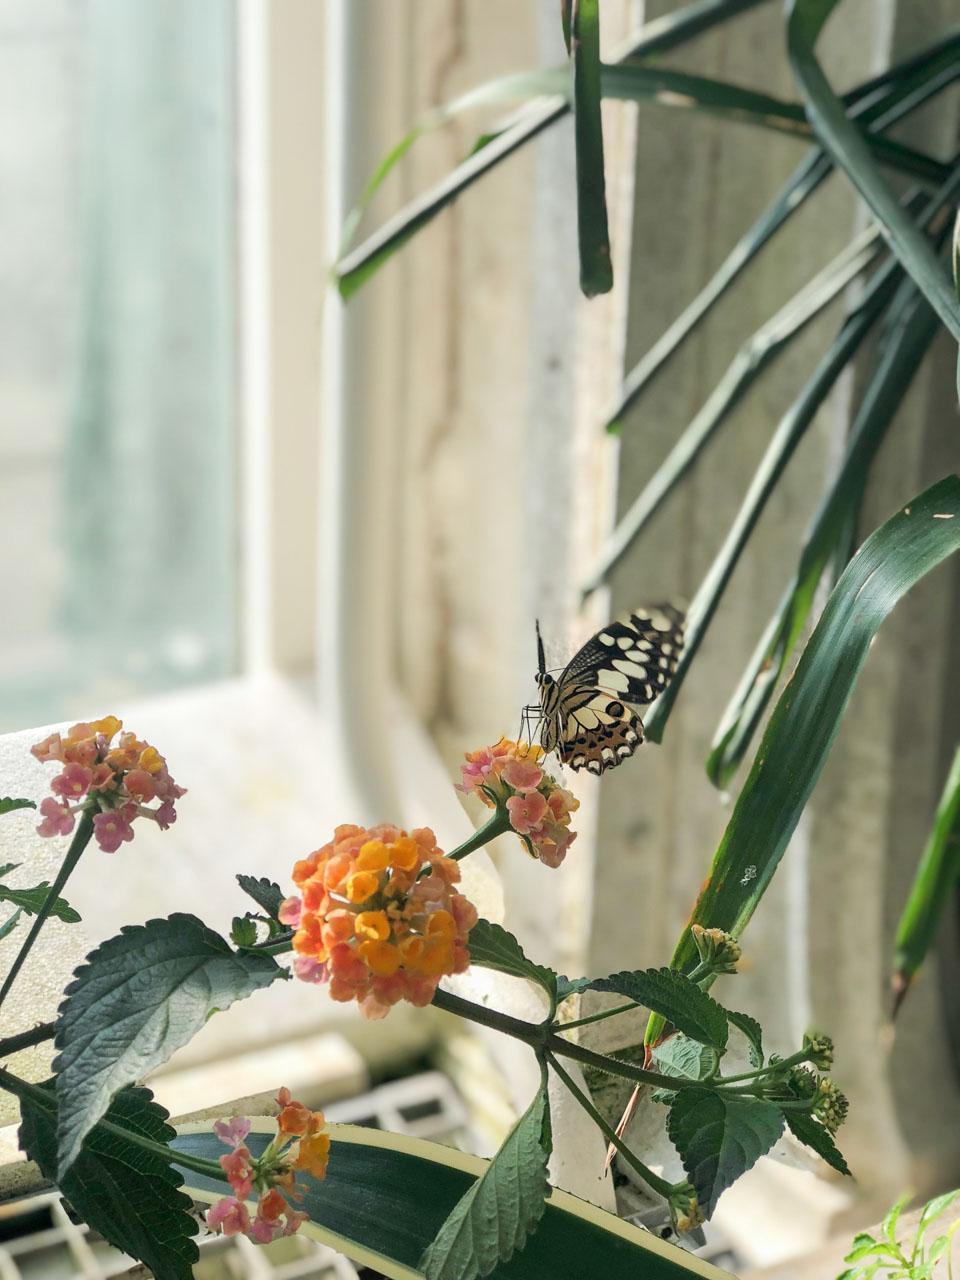 A butterfly at Schmetterlinghaus in Vienna, Austria